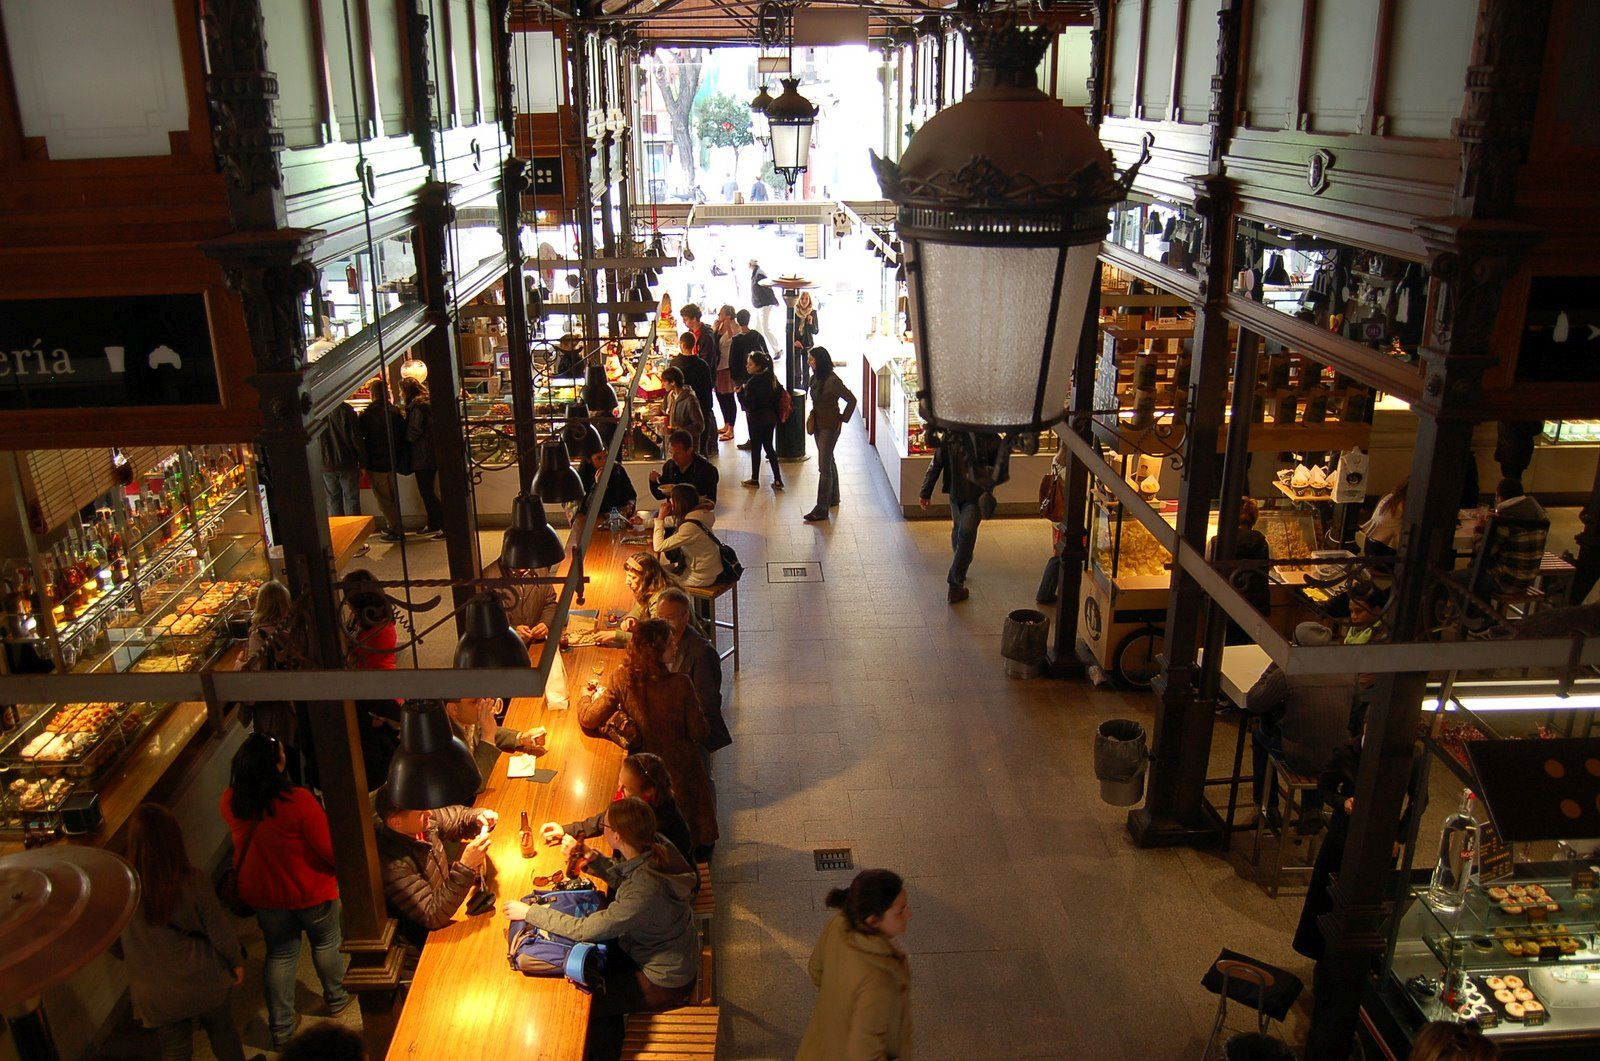 Mercado de San Miguel - Madrids Best Market